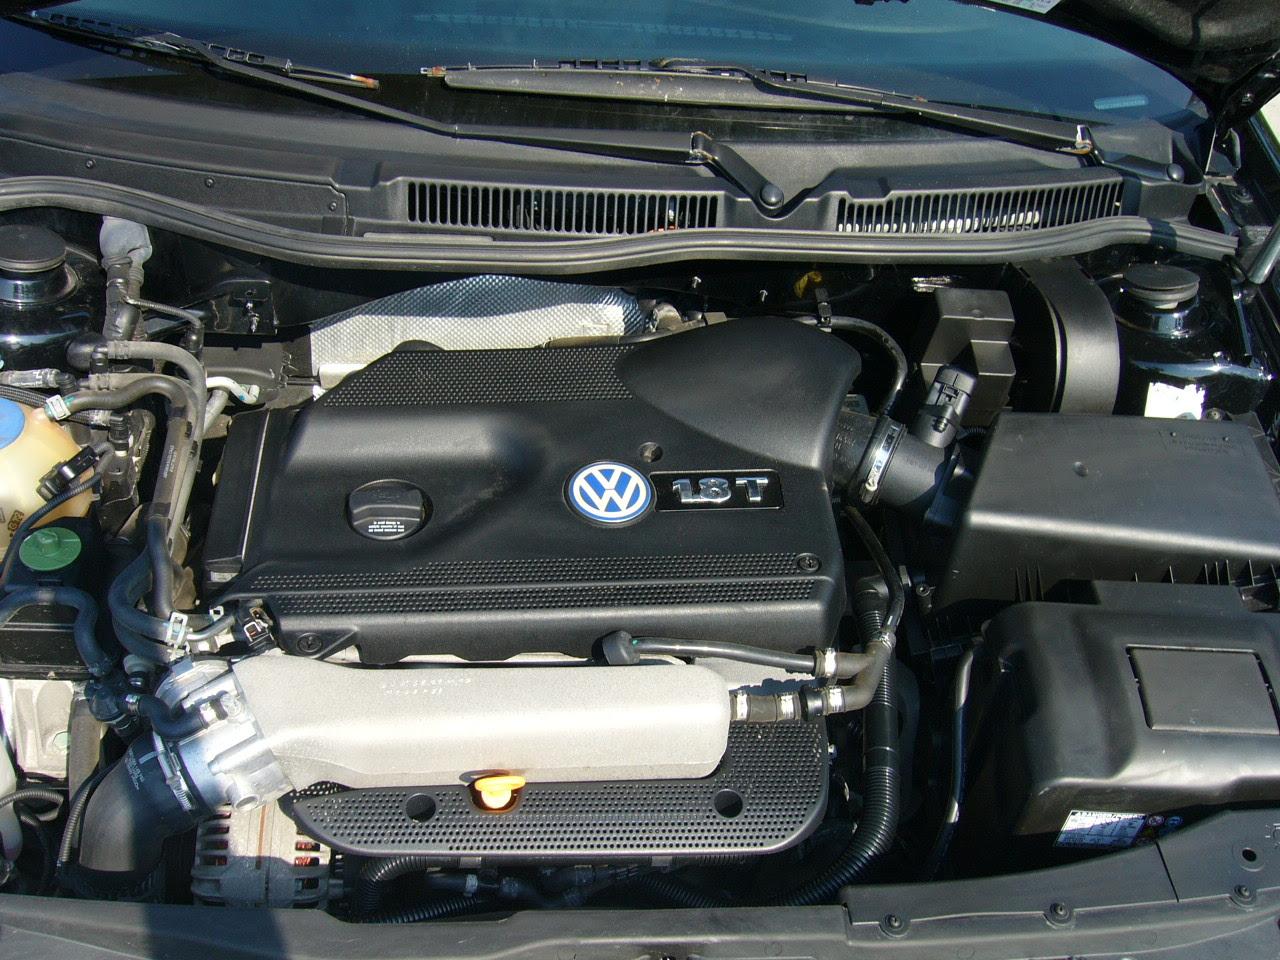 2002 Vw Jettum 1 8 Turbo Engine Diagram